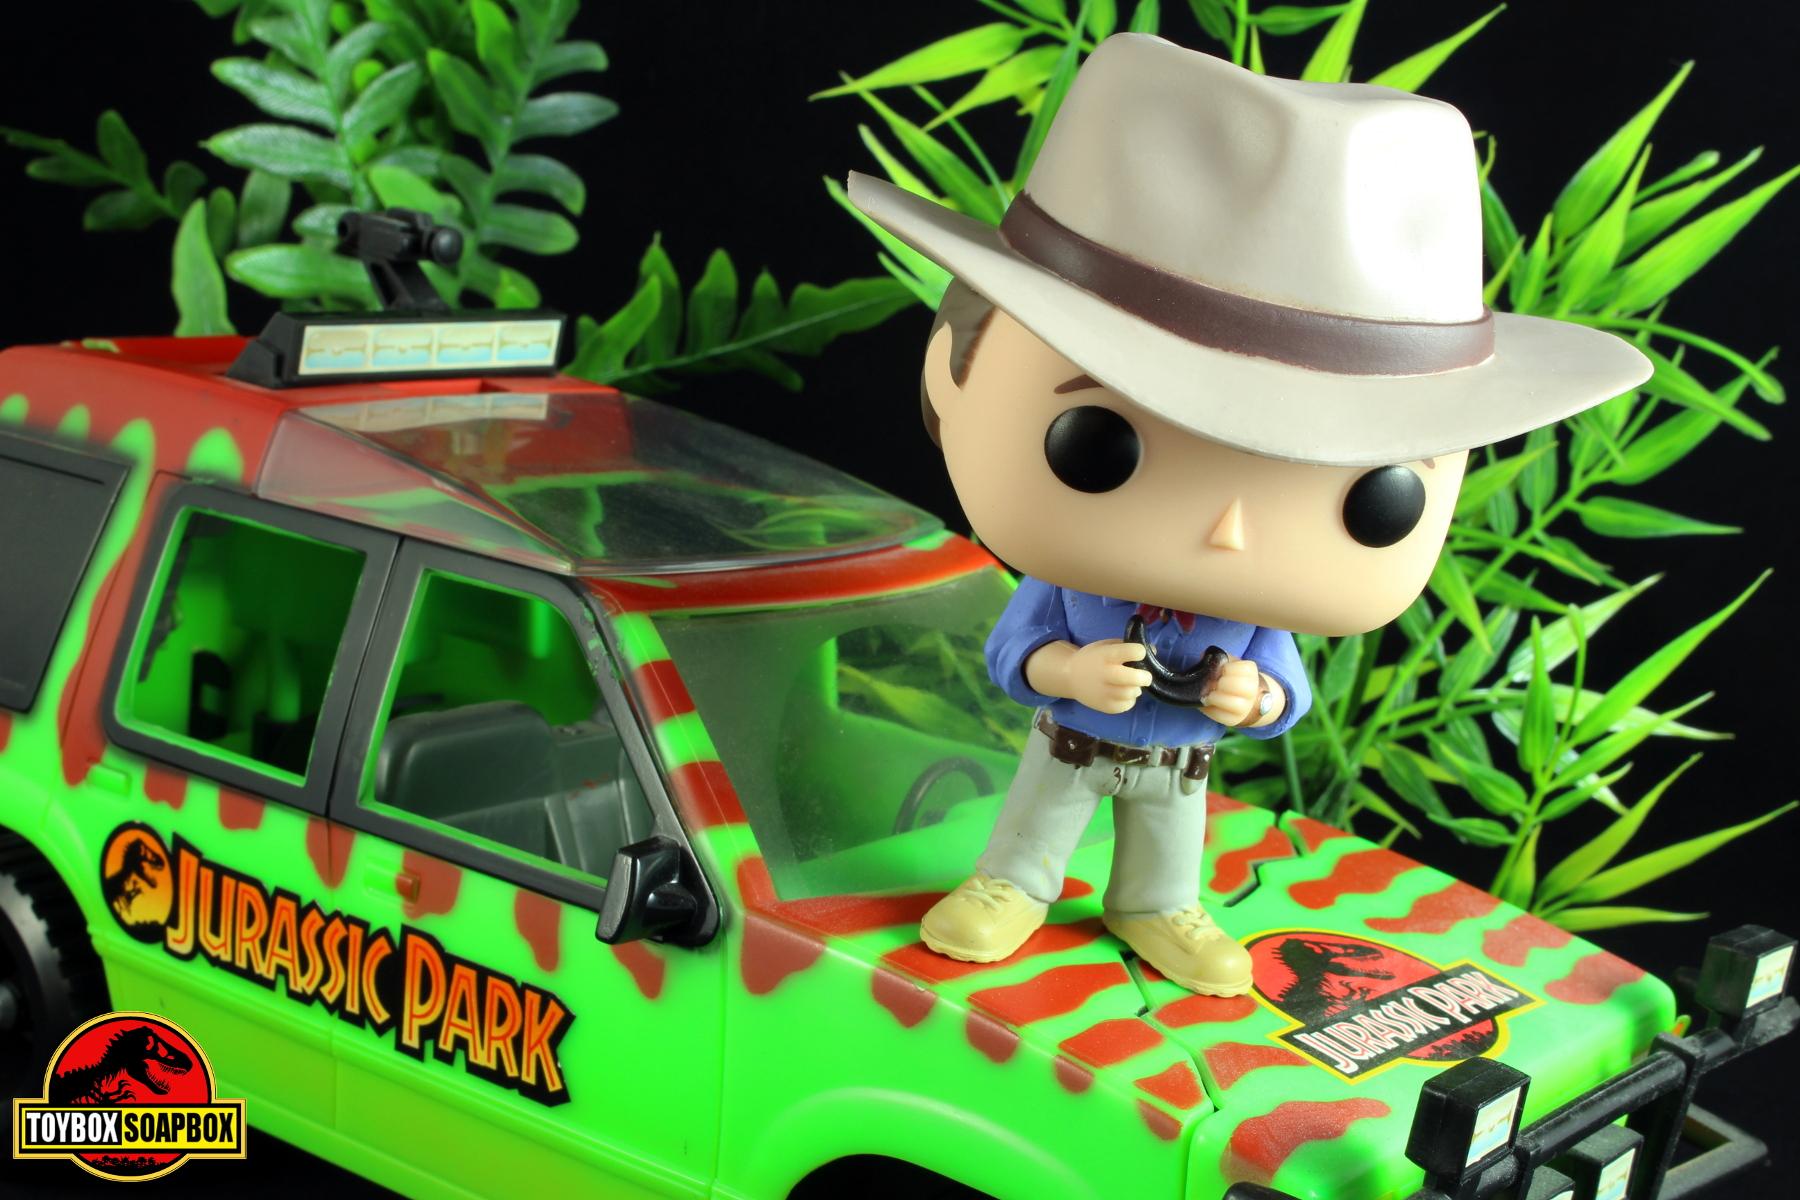 Spared No Expense Jurassic Park Funko Pop Vinyls Review